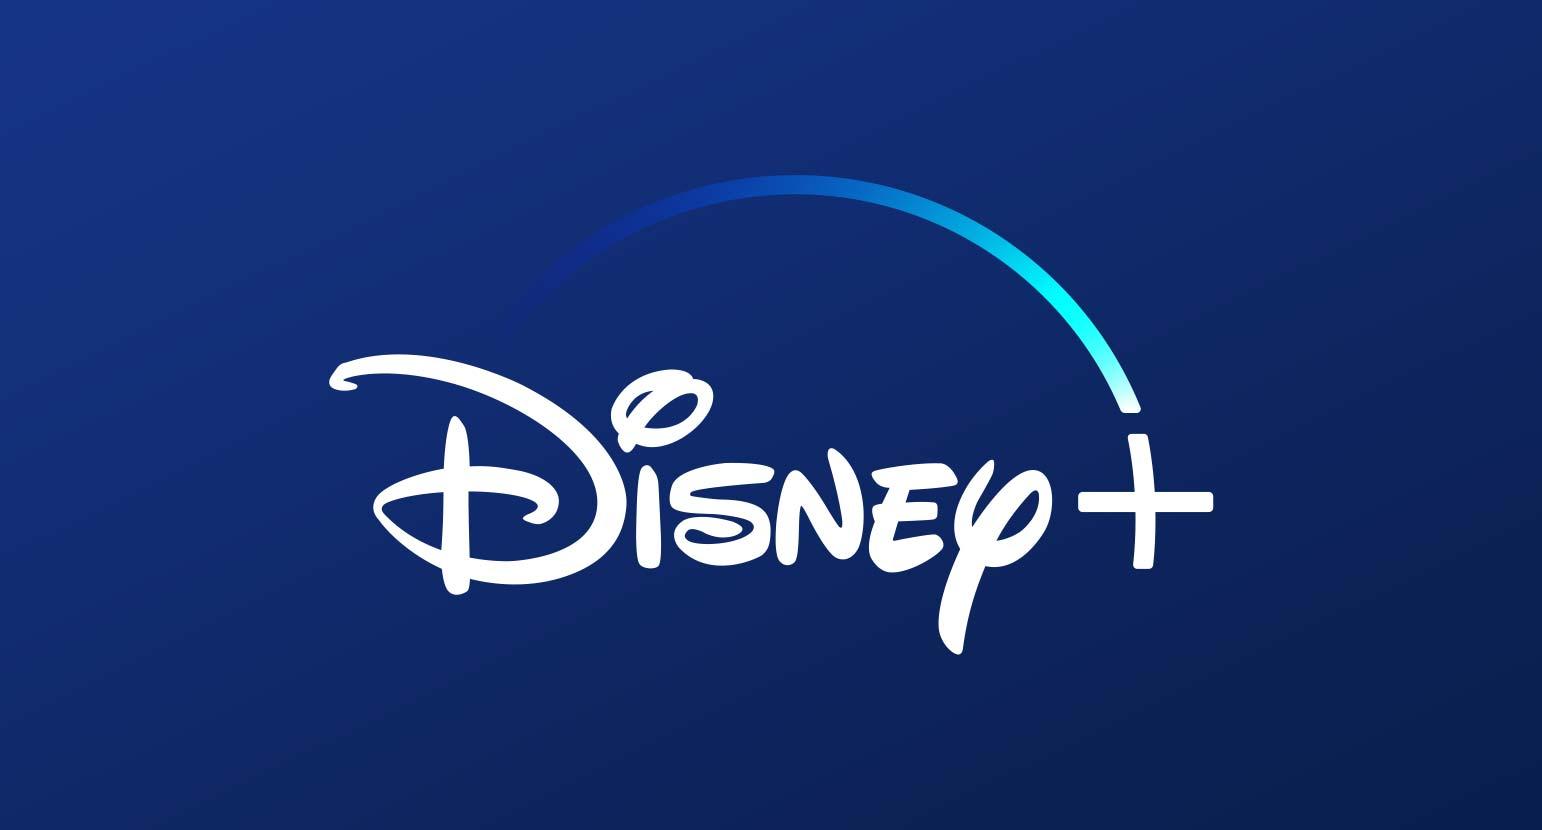 Disney Plus is coming to Australia